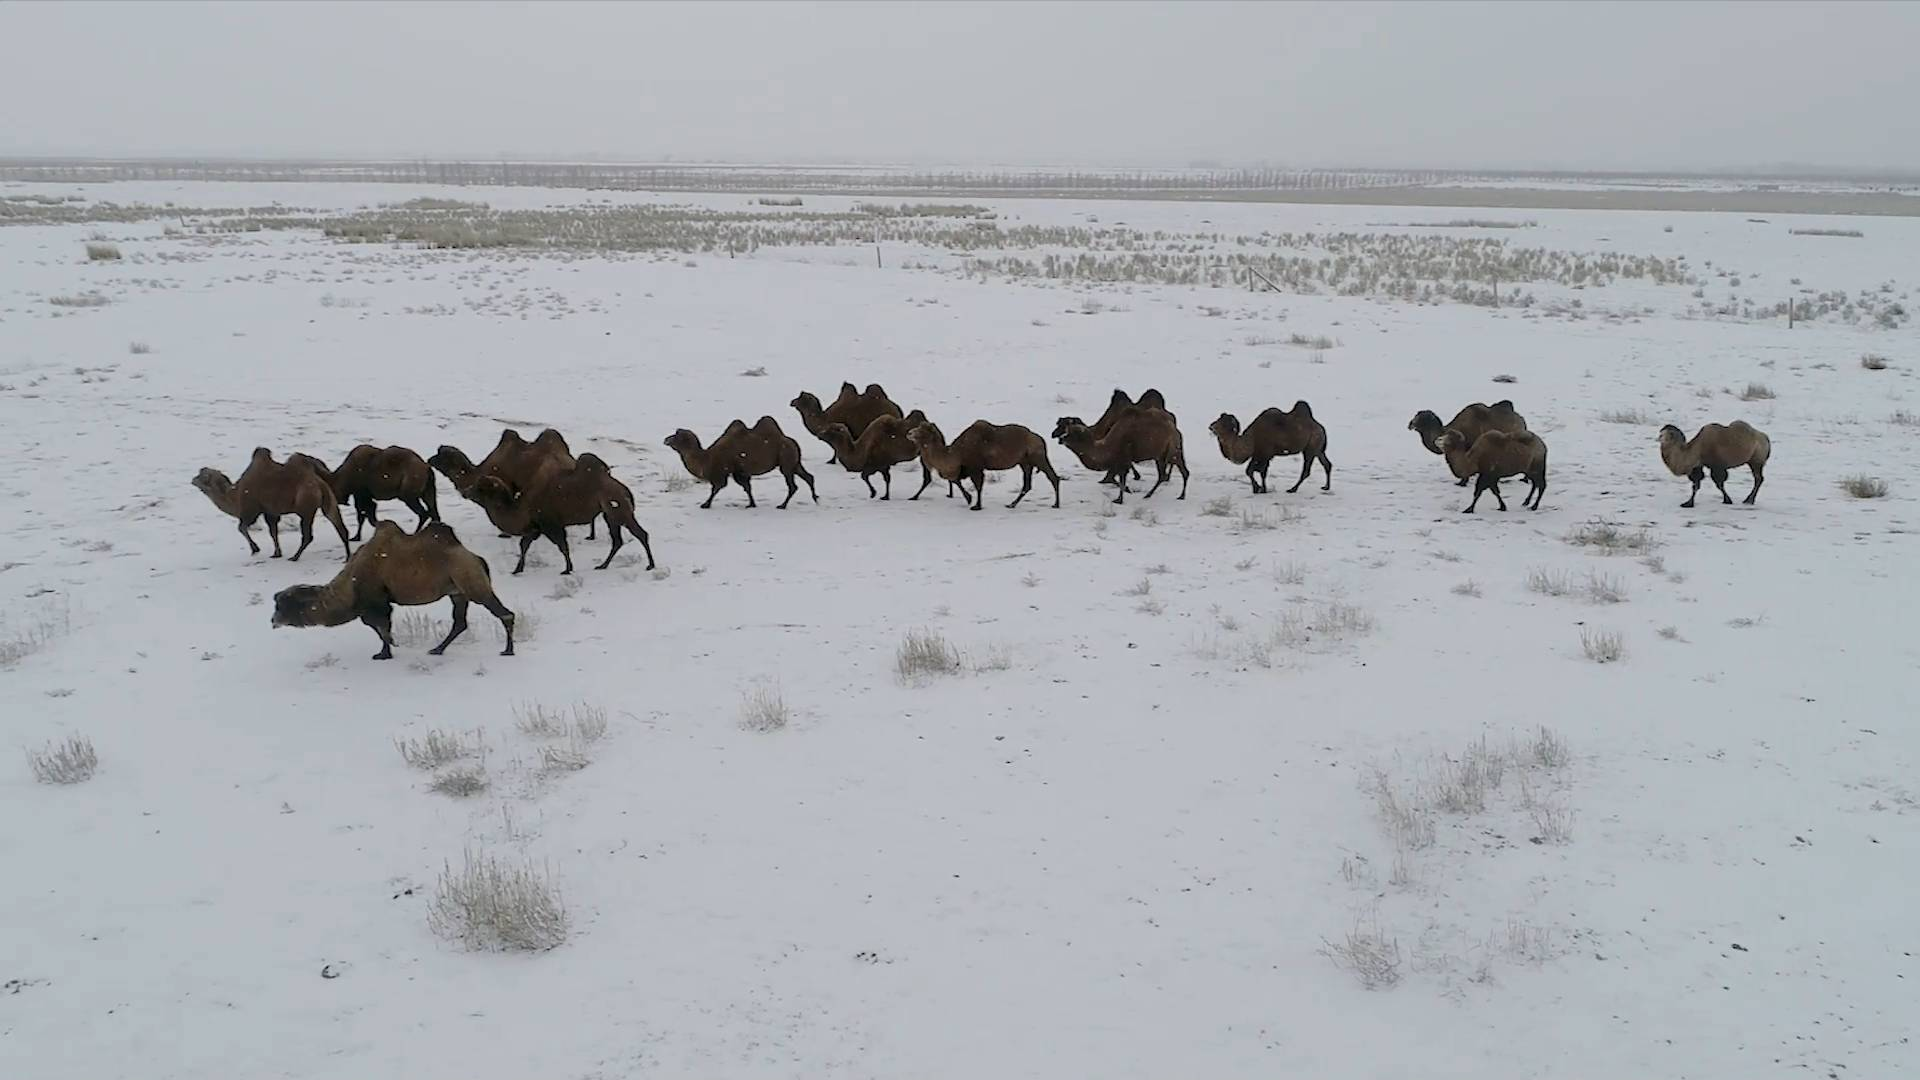 GLOBALink | Camel breeding helps Kazakh herdsmen shake off poverty in Xinjiang